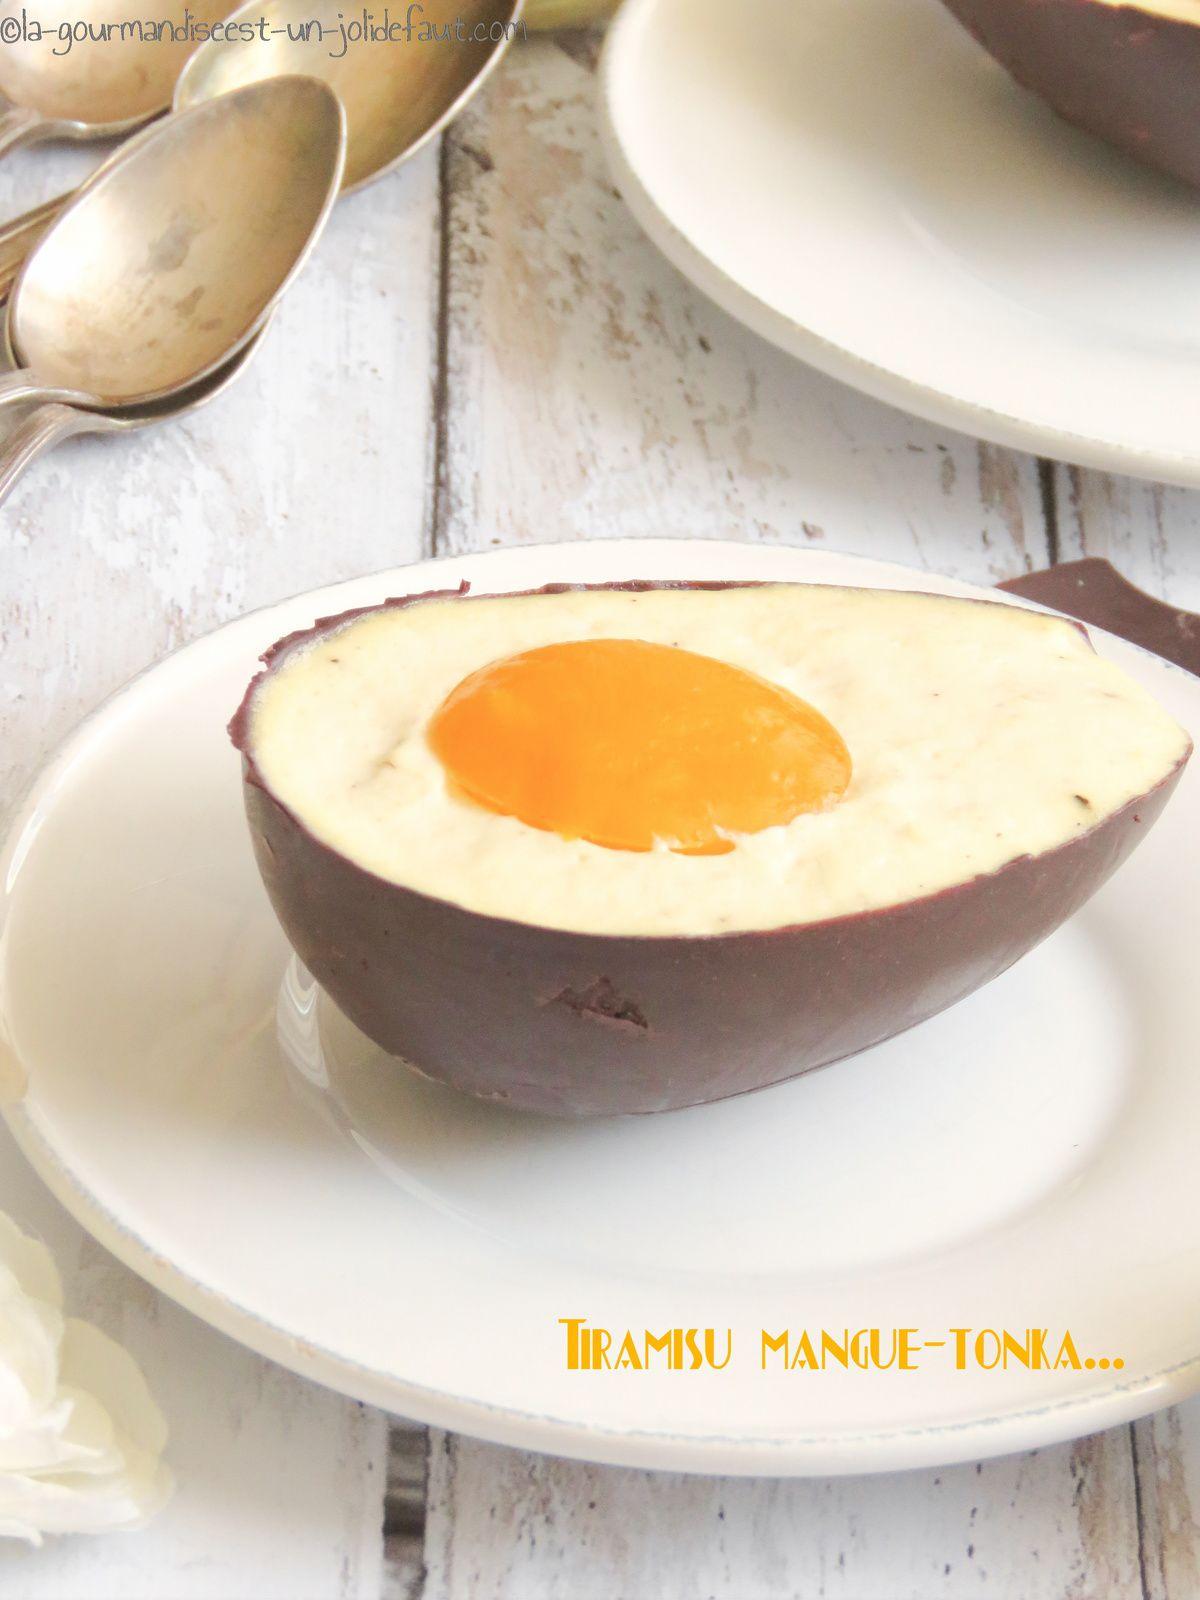 Tiramisu mangue-tonka en coque de chocolat